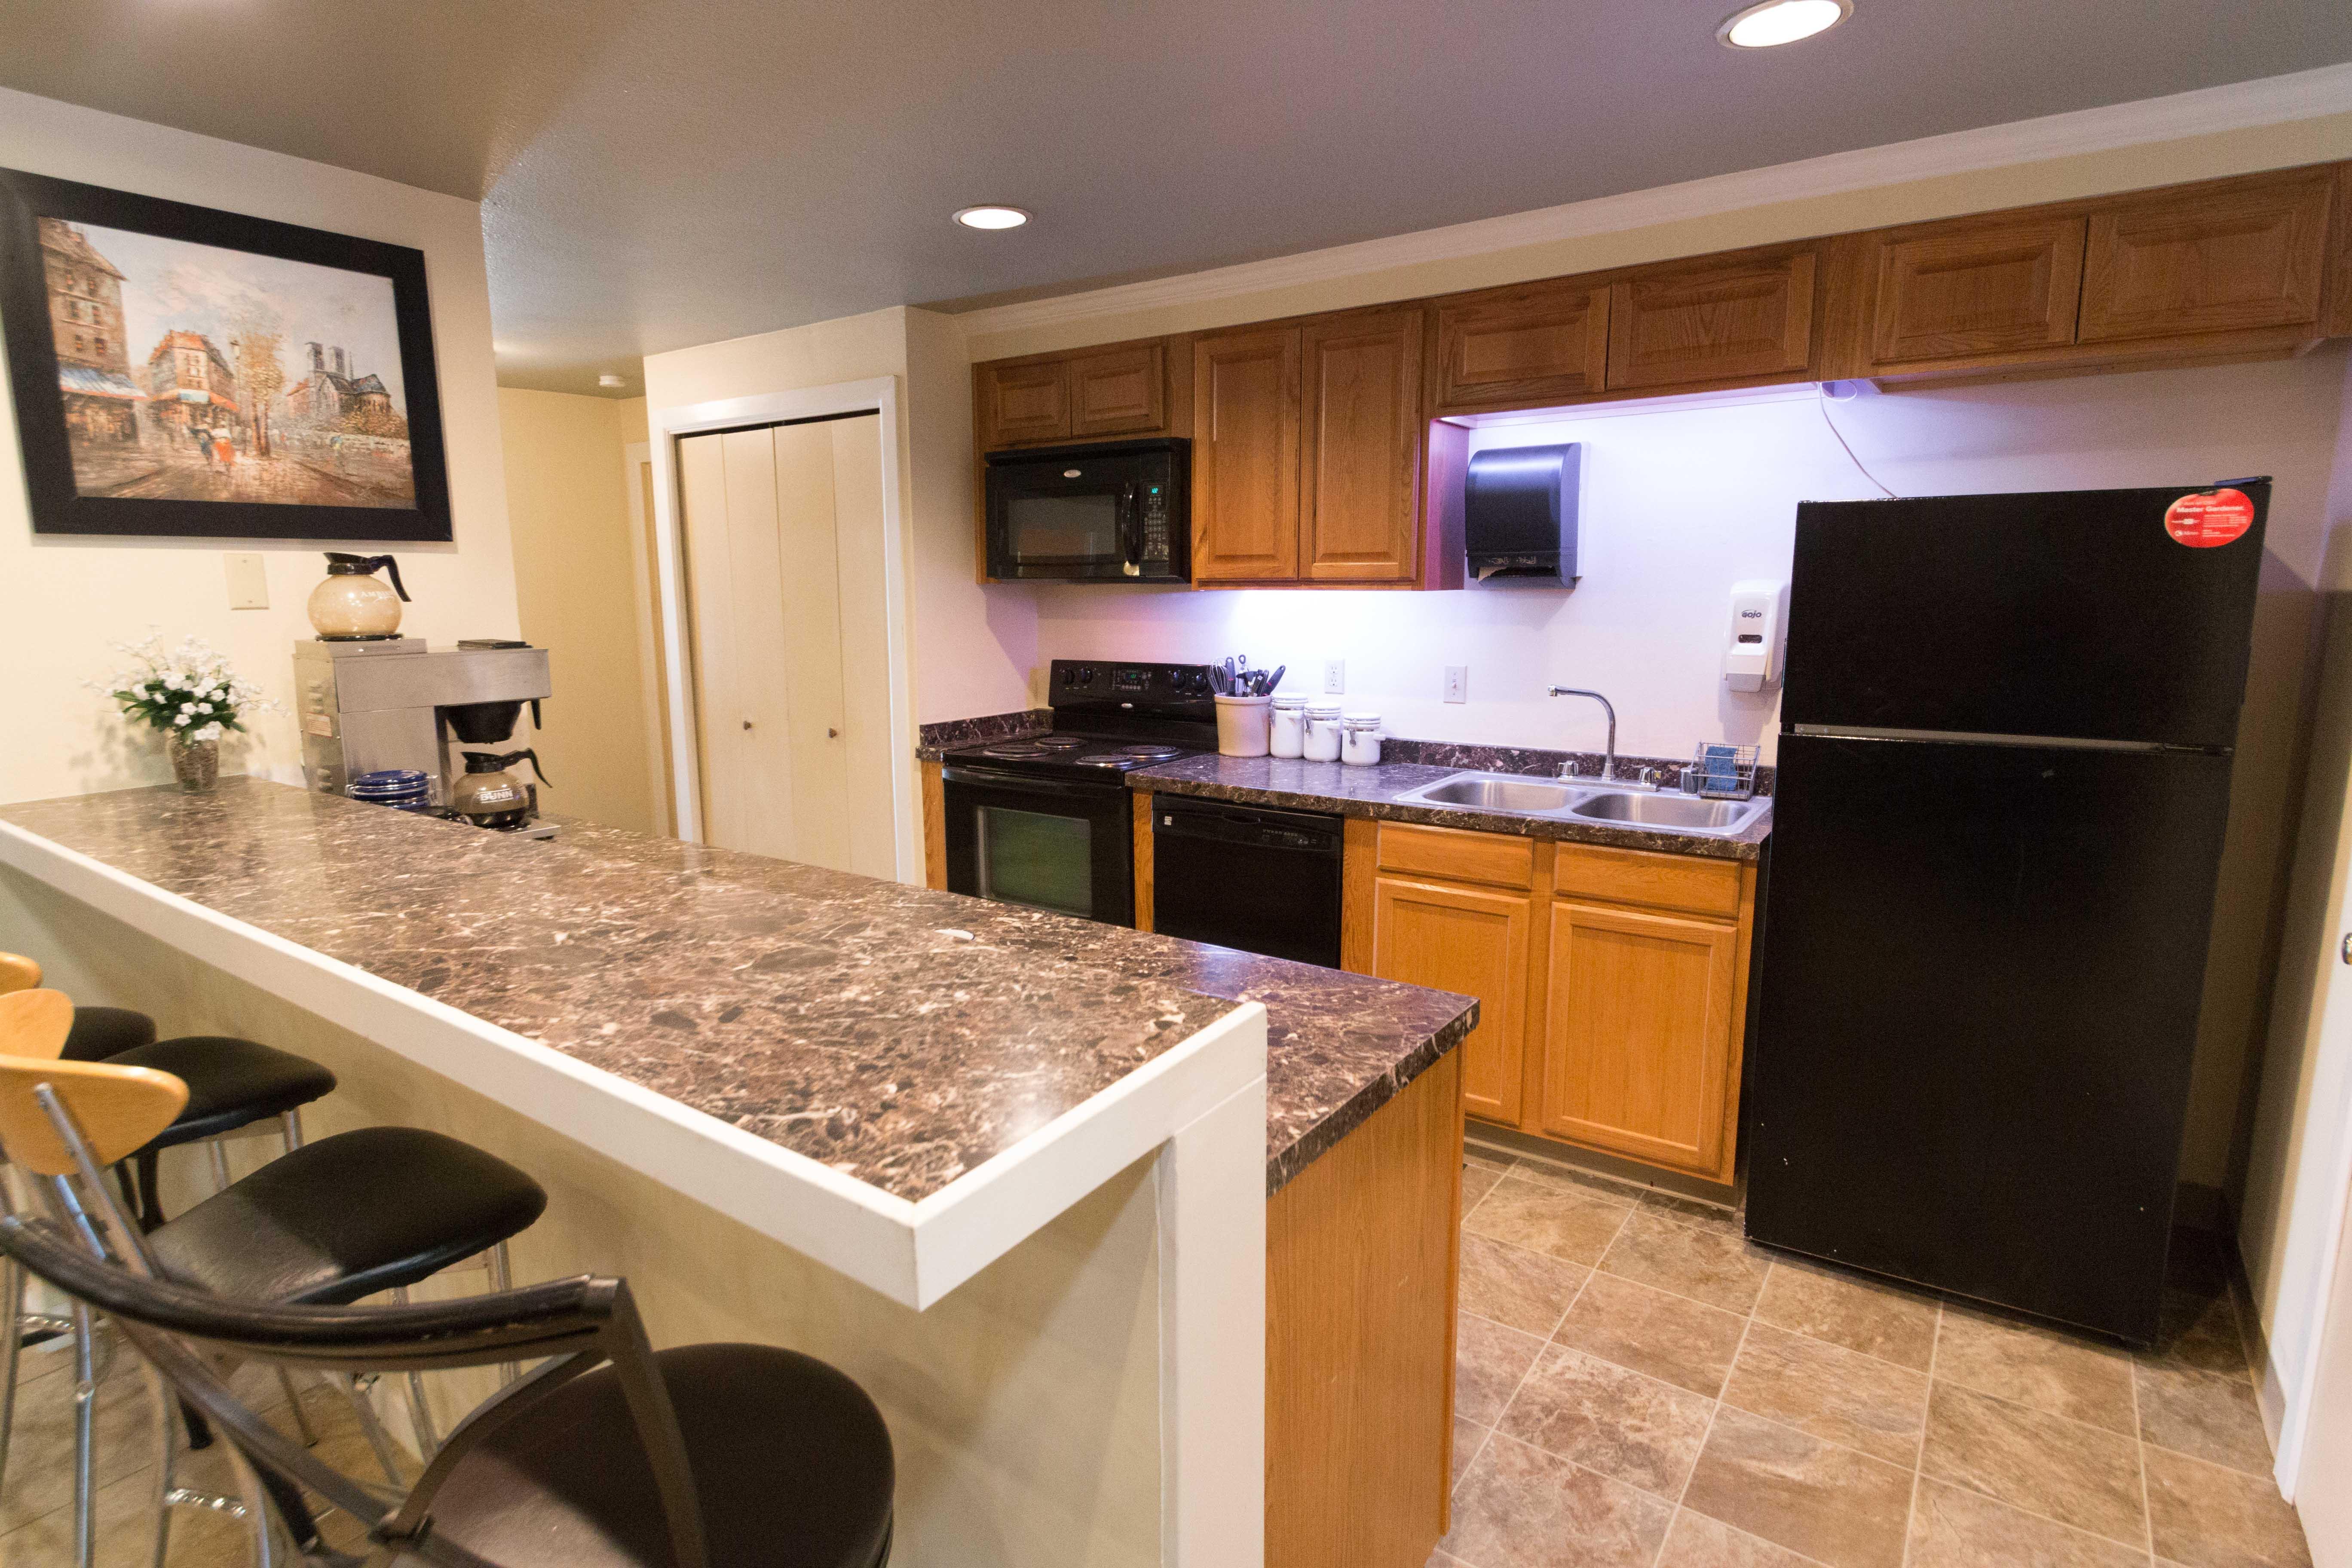 Our apartments in Vancouver, Washington showcase a modern kitchen